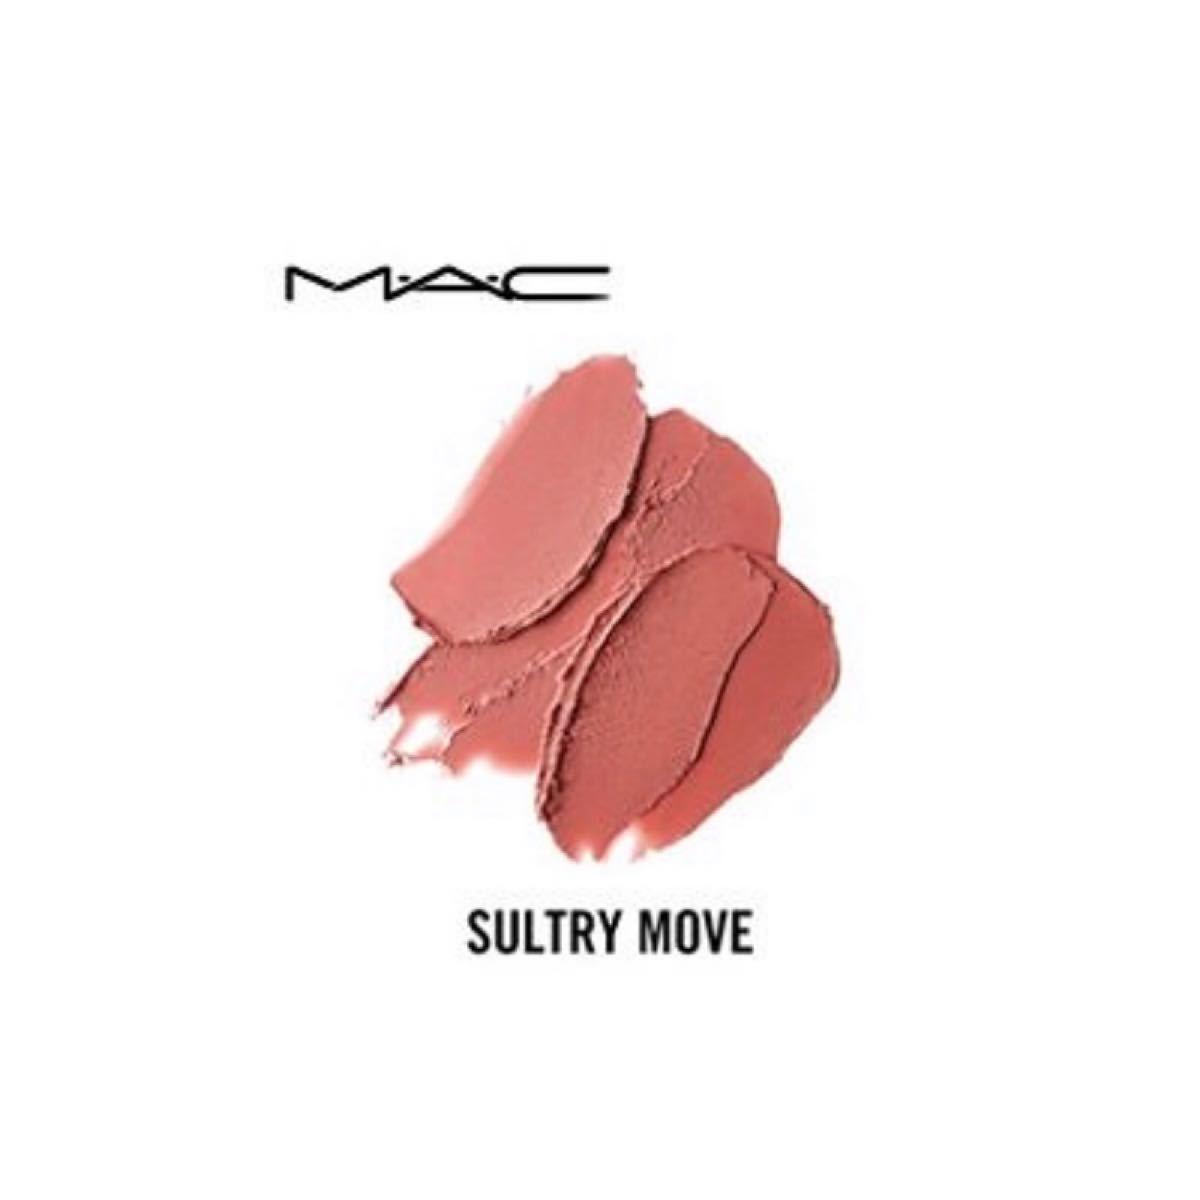 MAC/【SULTLY MOVE】パウダーキス リップスティック 口紅 マック サルトリームーブ